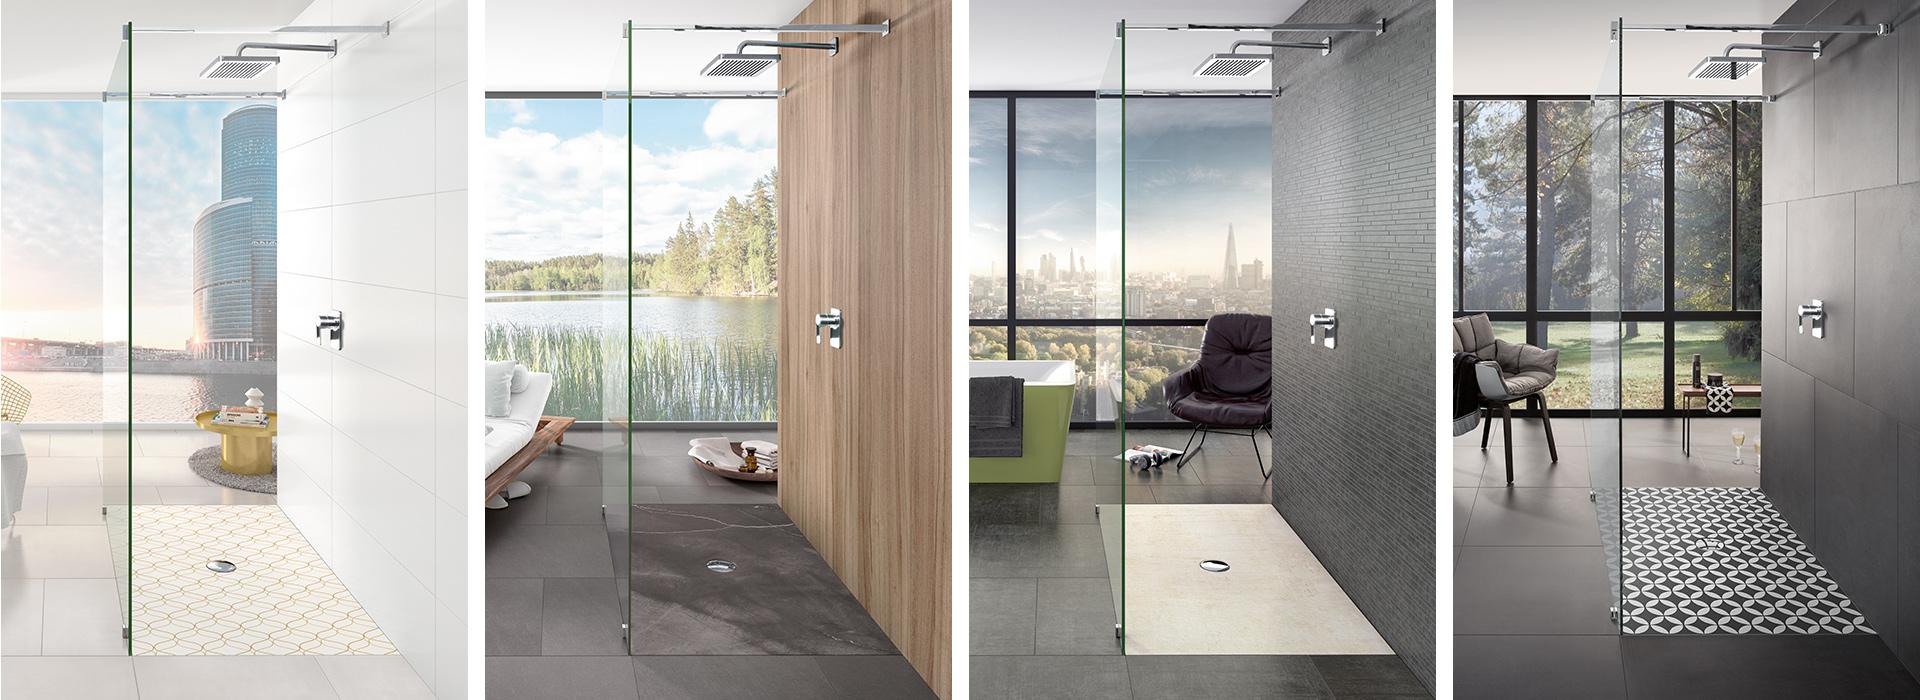 Awesome Www Villeroy Boch Nl Badkamer Contemporary - House Design ...